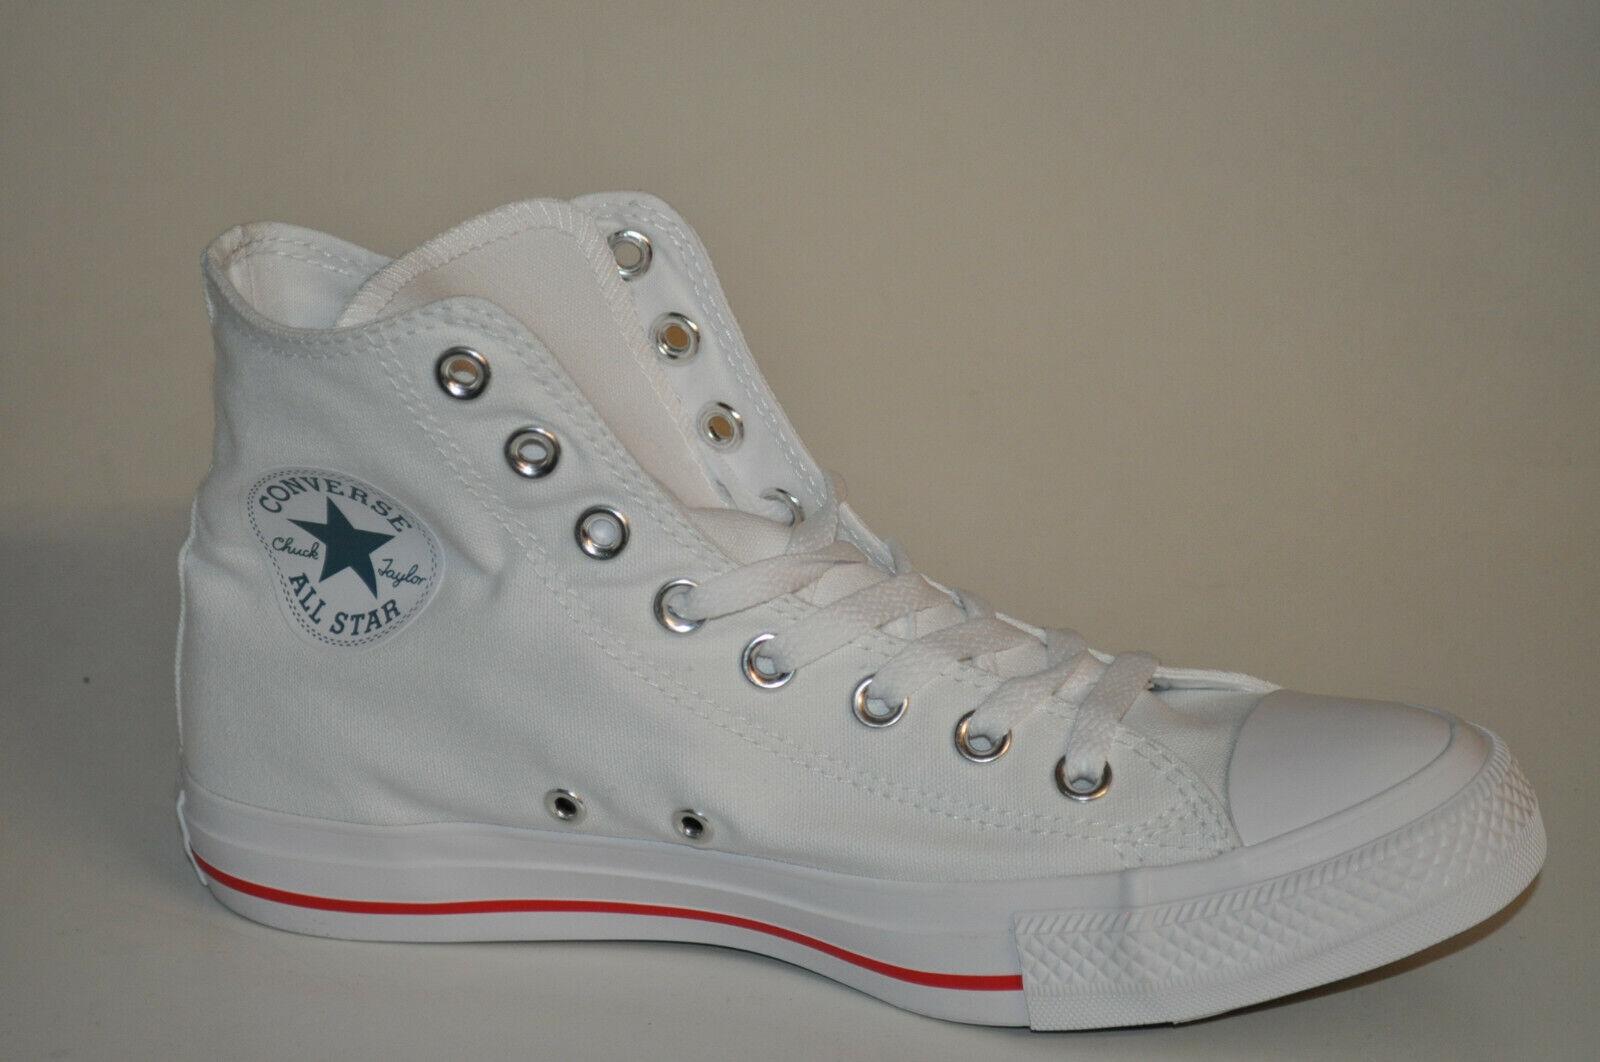 Converse ALL STAR HI 164683C White Celestial Teal Fiery Red white All Star Chucks